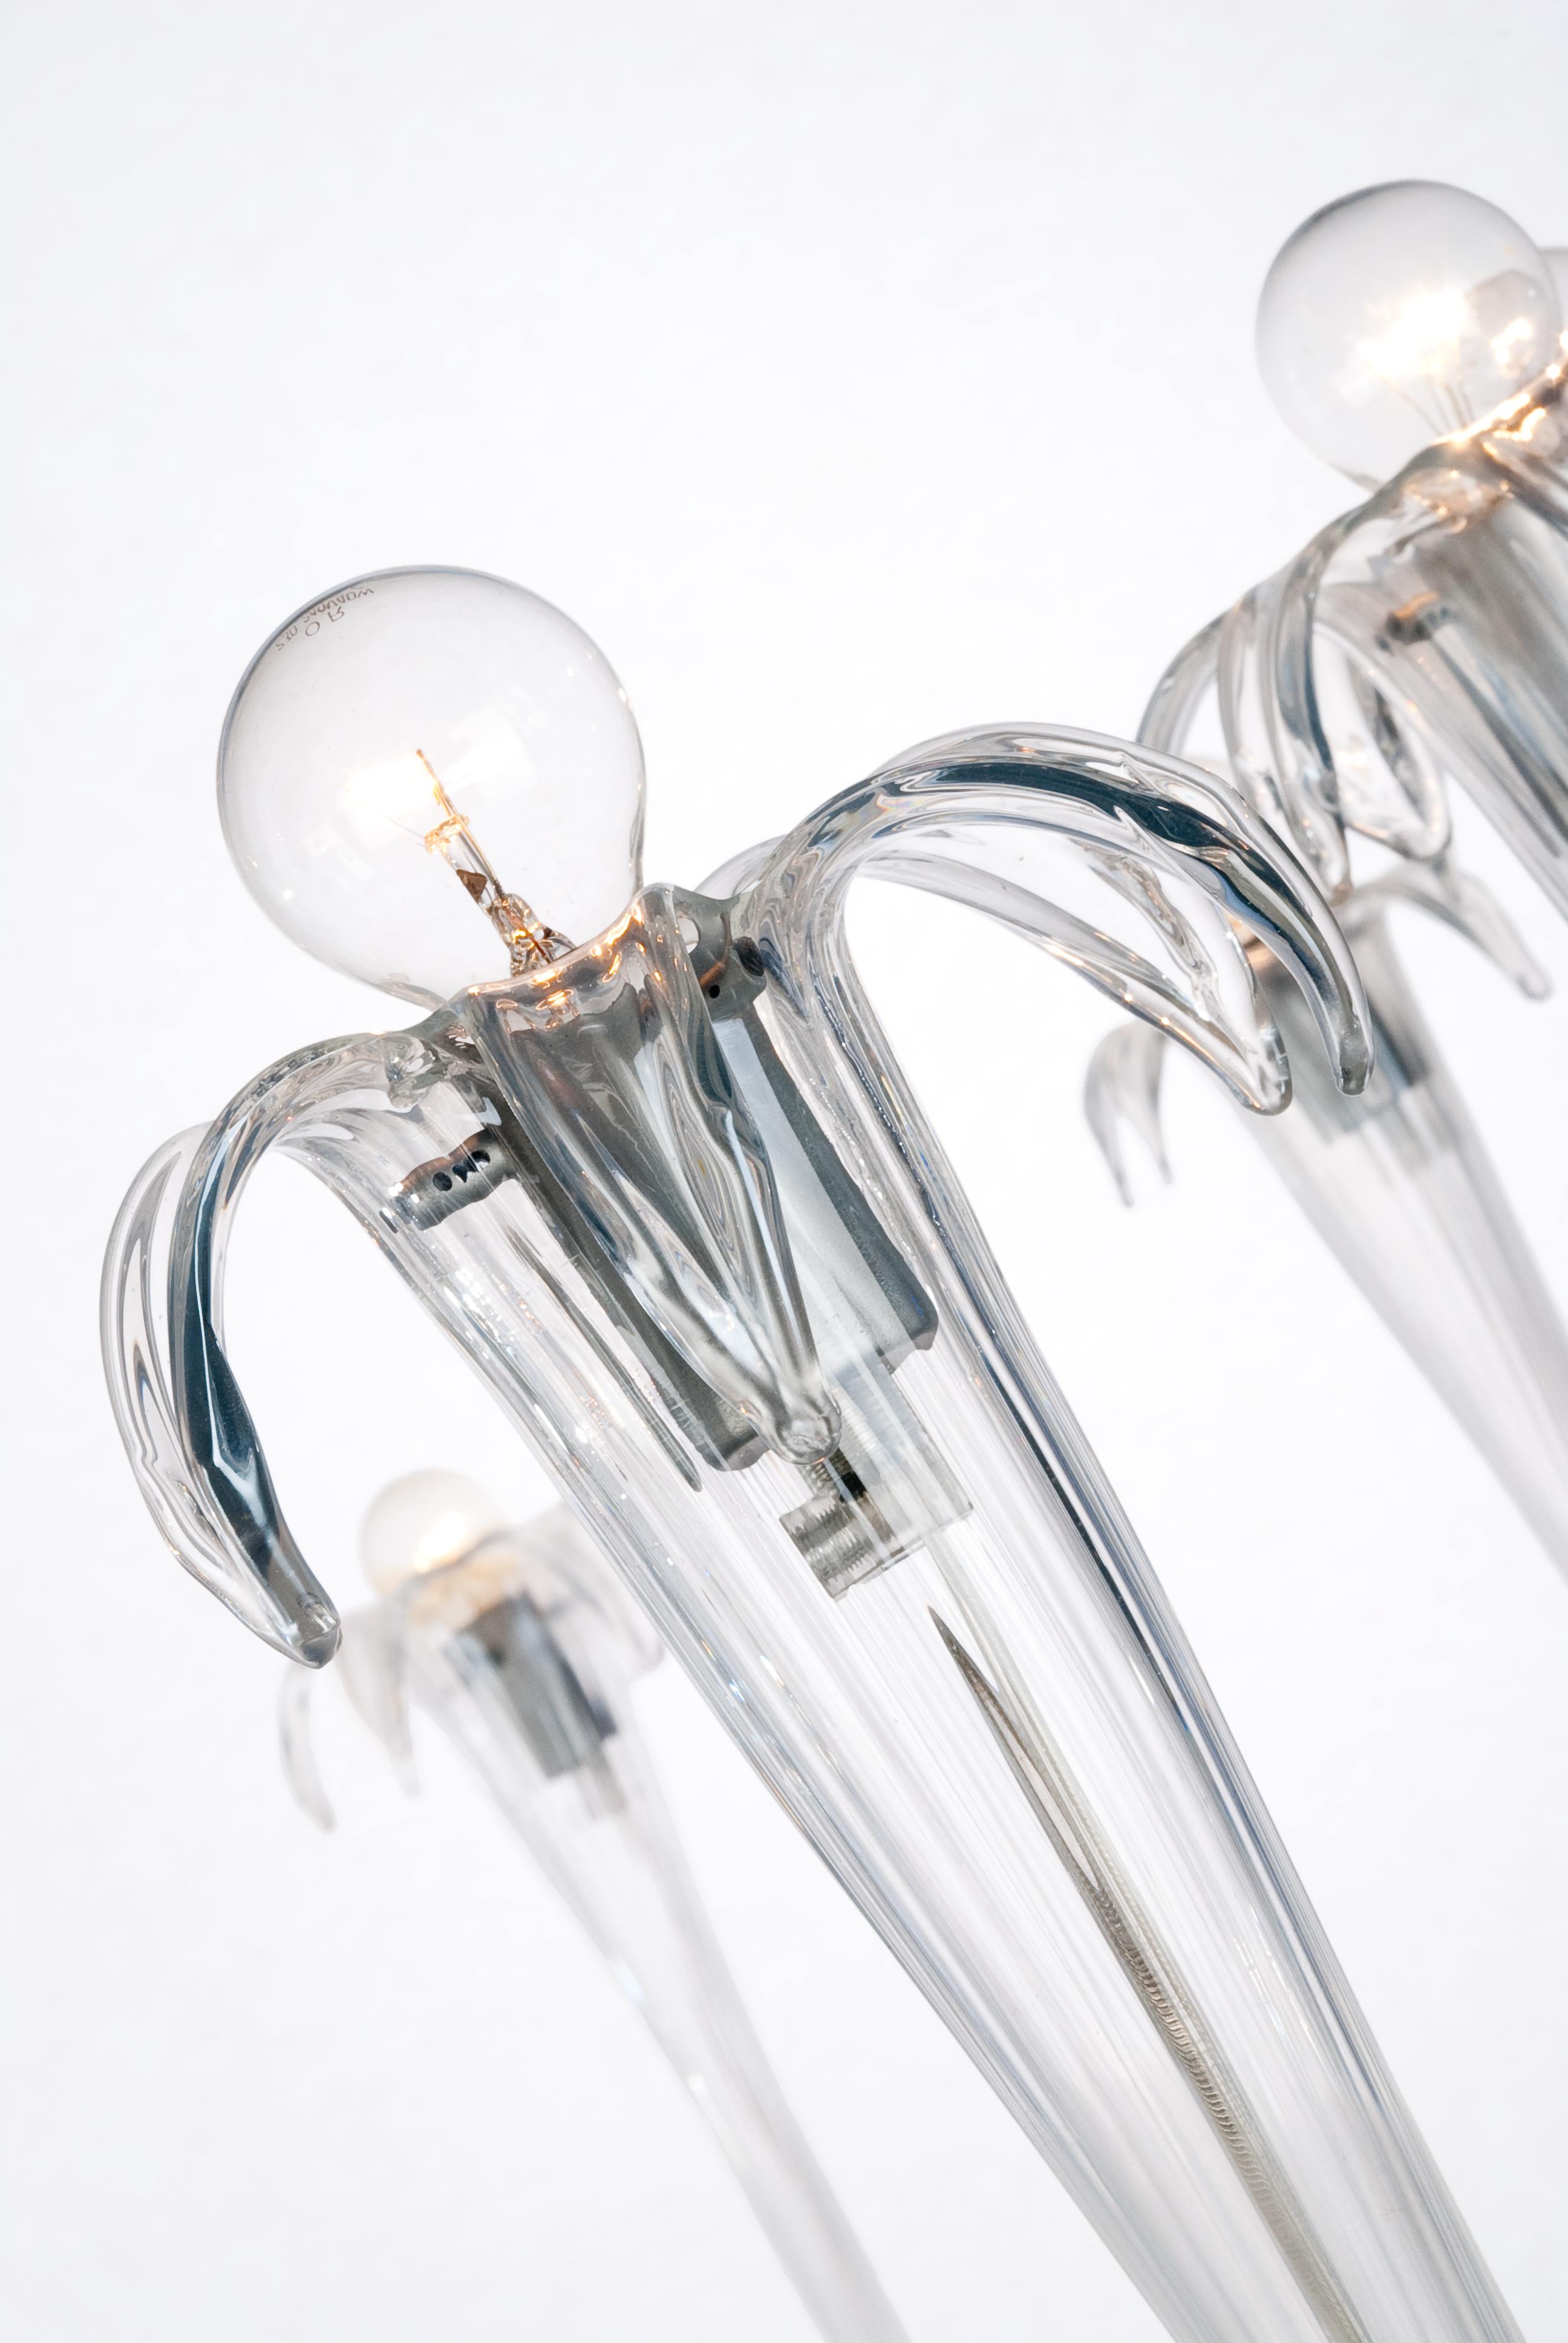 jets-eaux-chandelier-lustre-andre-arbus-veronese-4.jpg